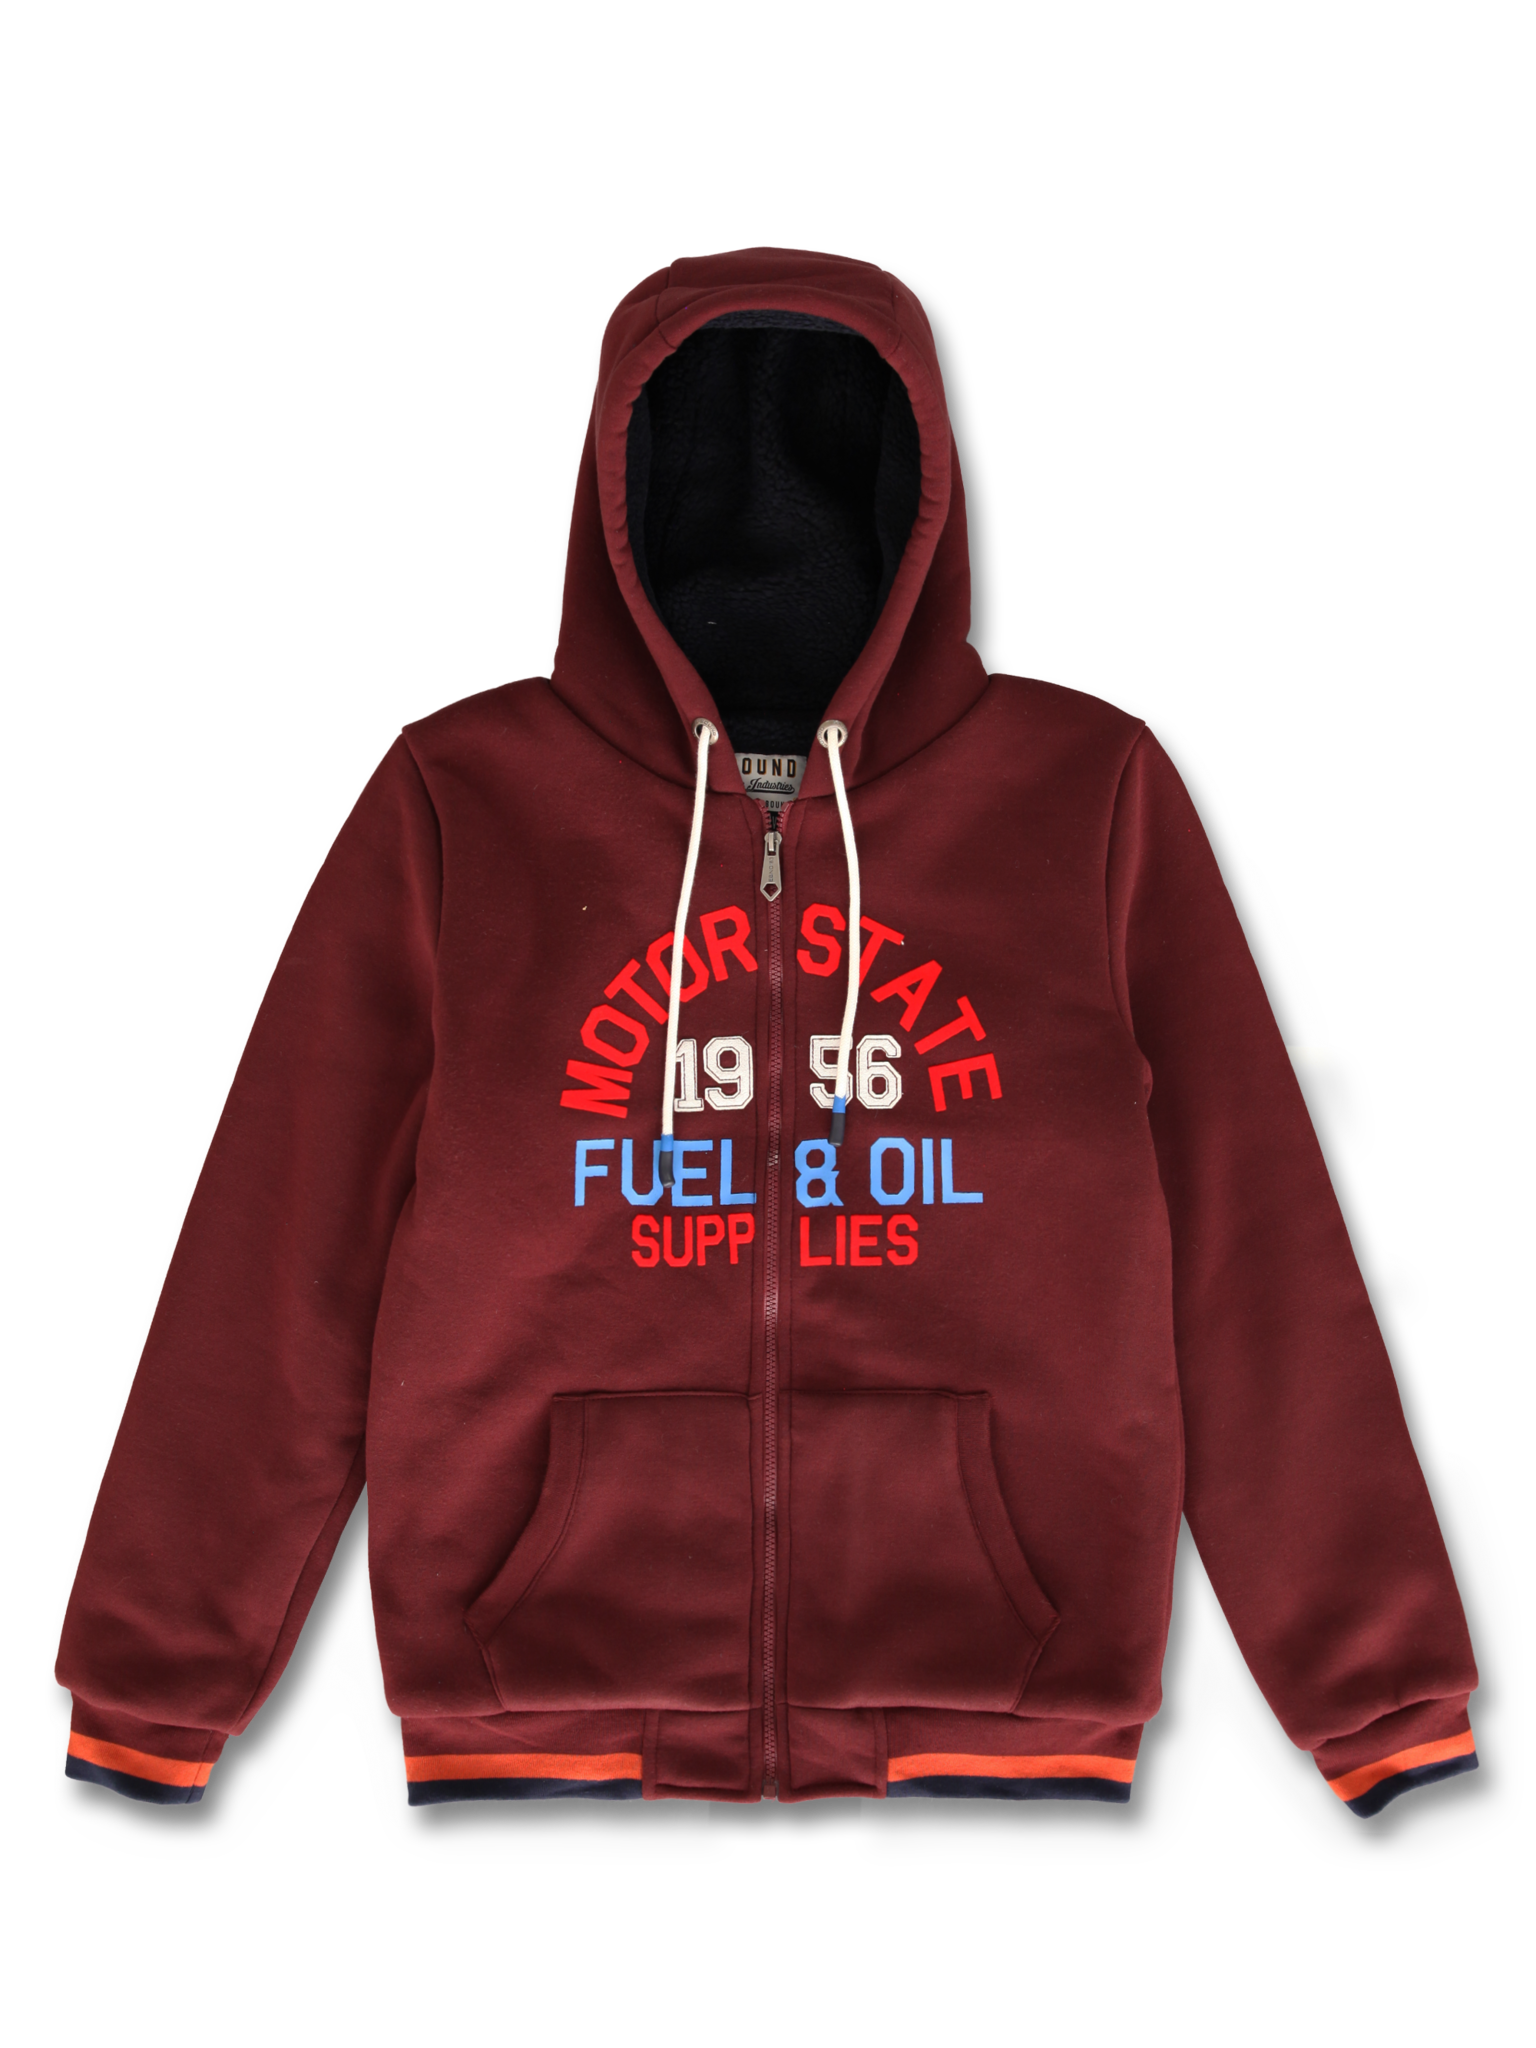 All Brands | Winterproducts Men | Cardigan Sweater | 12 pcs/box